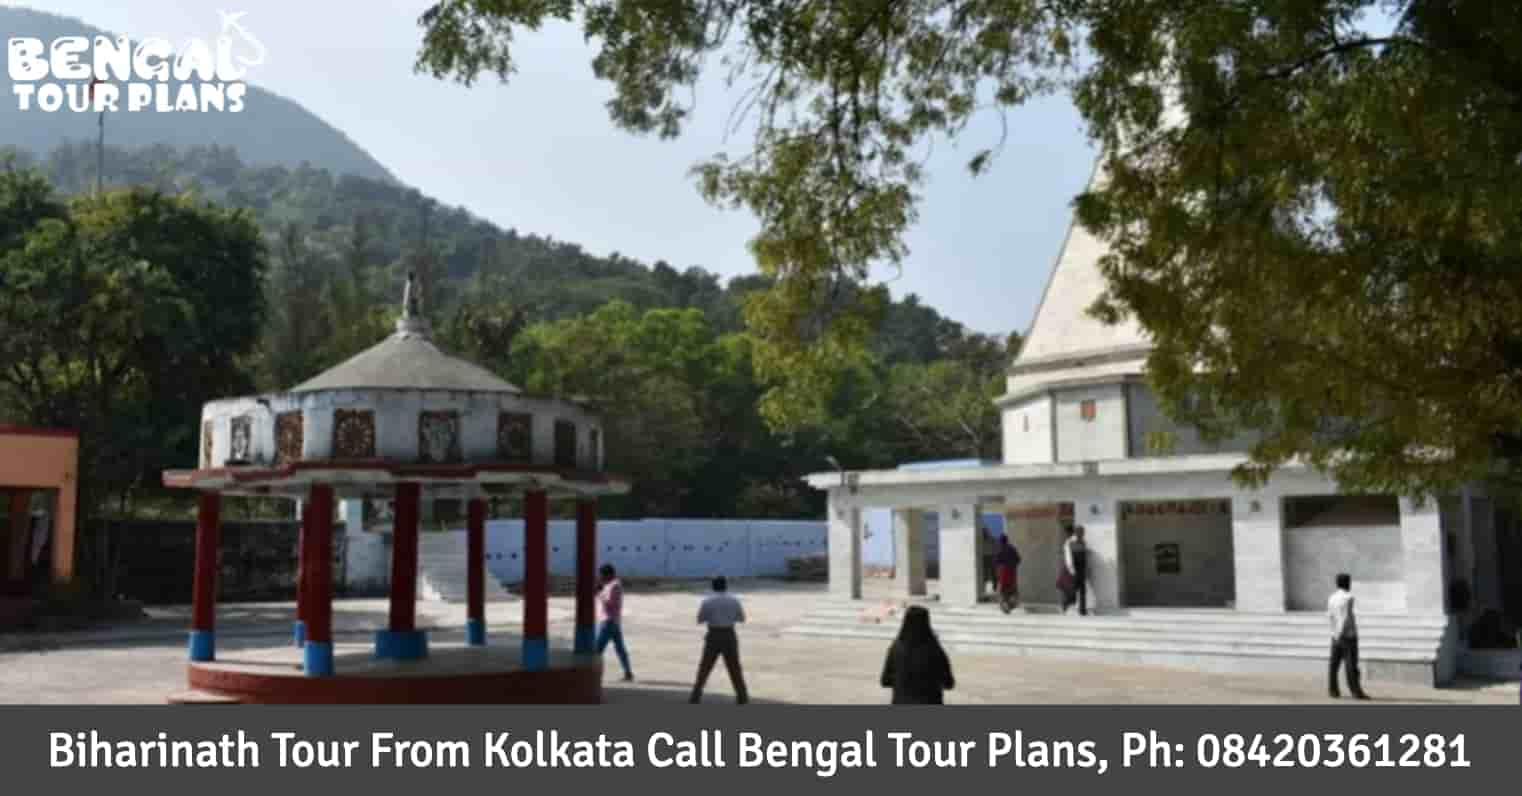 Biharinath Tour From Kolkata